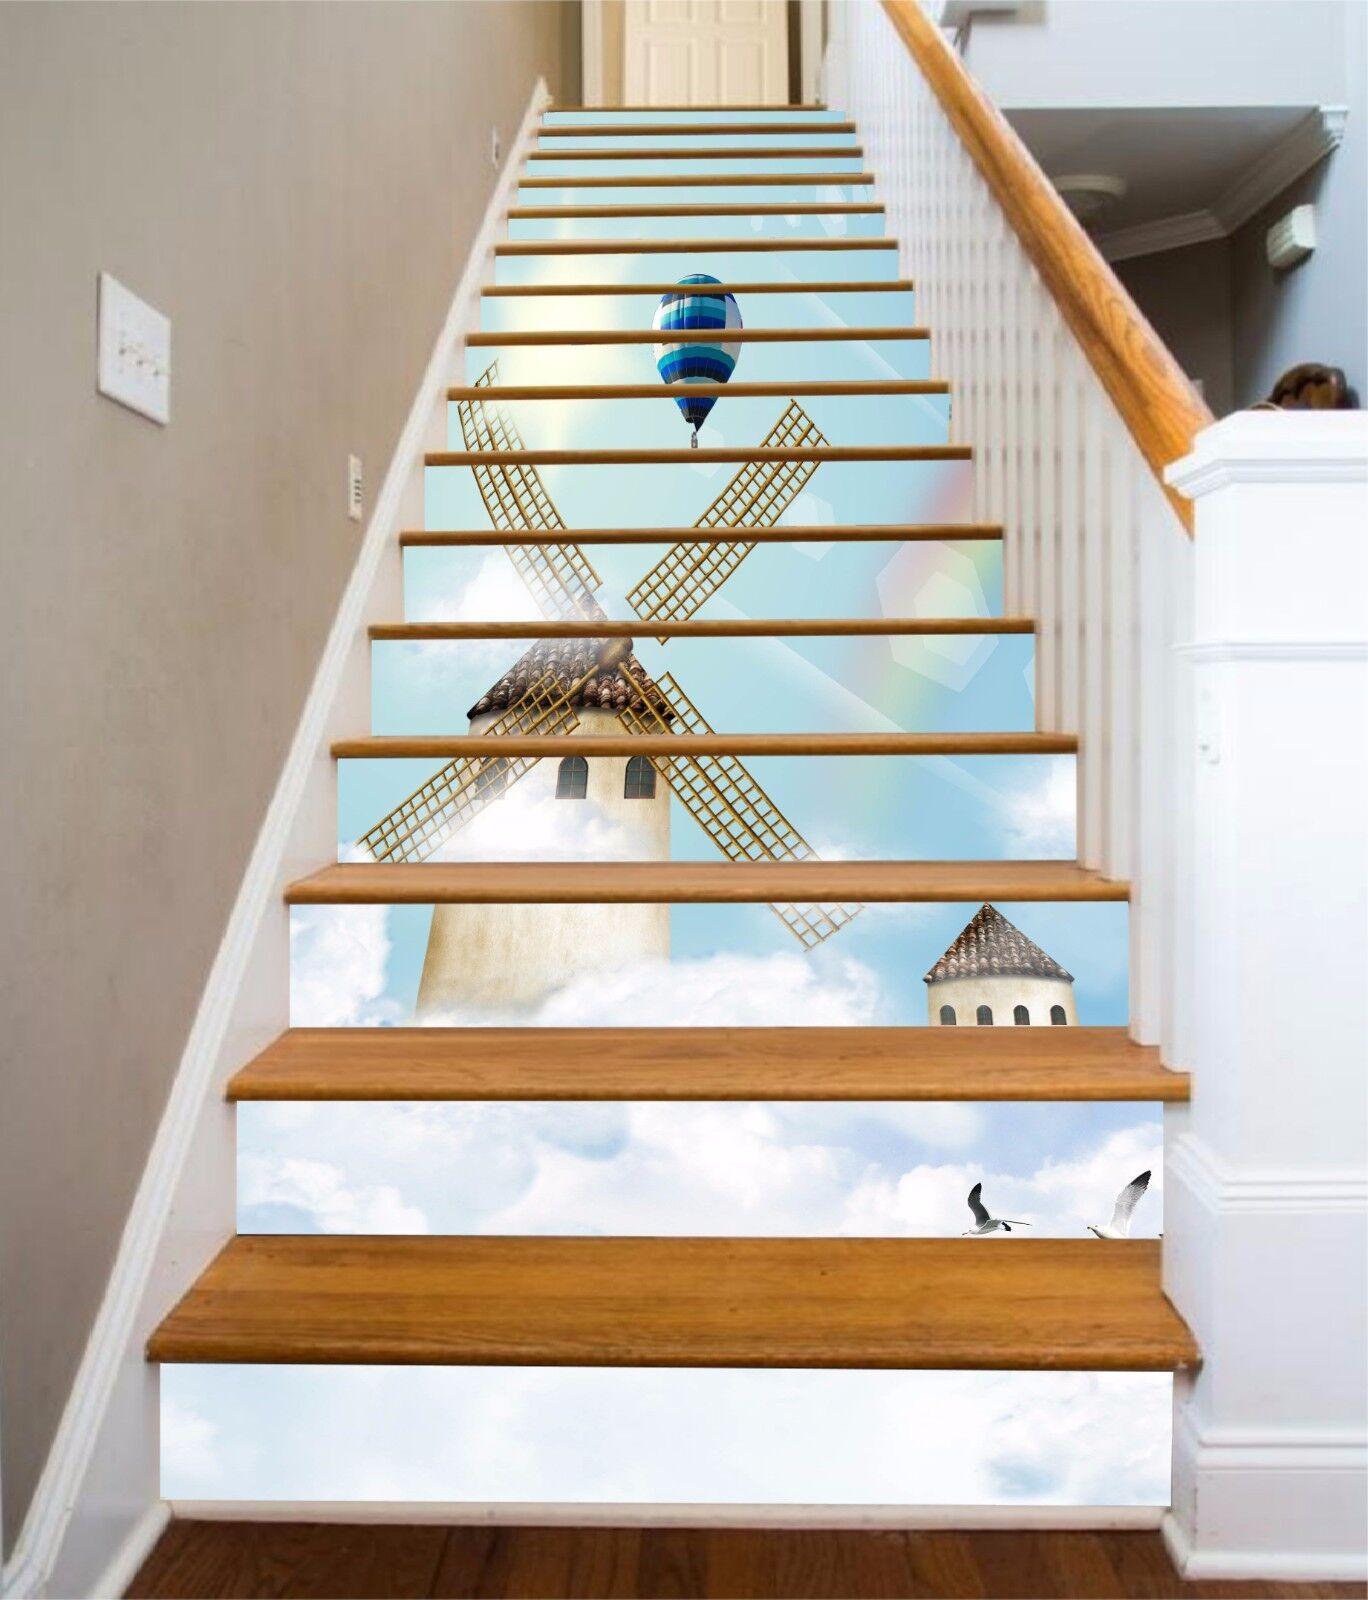 3D Sky windmill Stair Risers Decoration Photo Mural Vinyl Decal Wallpaper AU